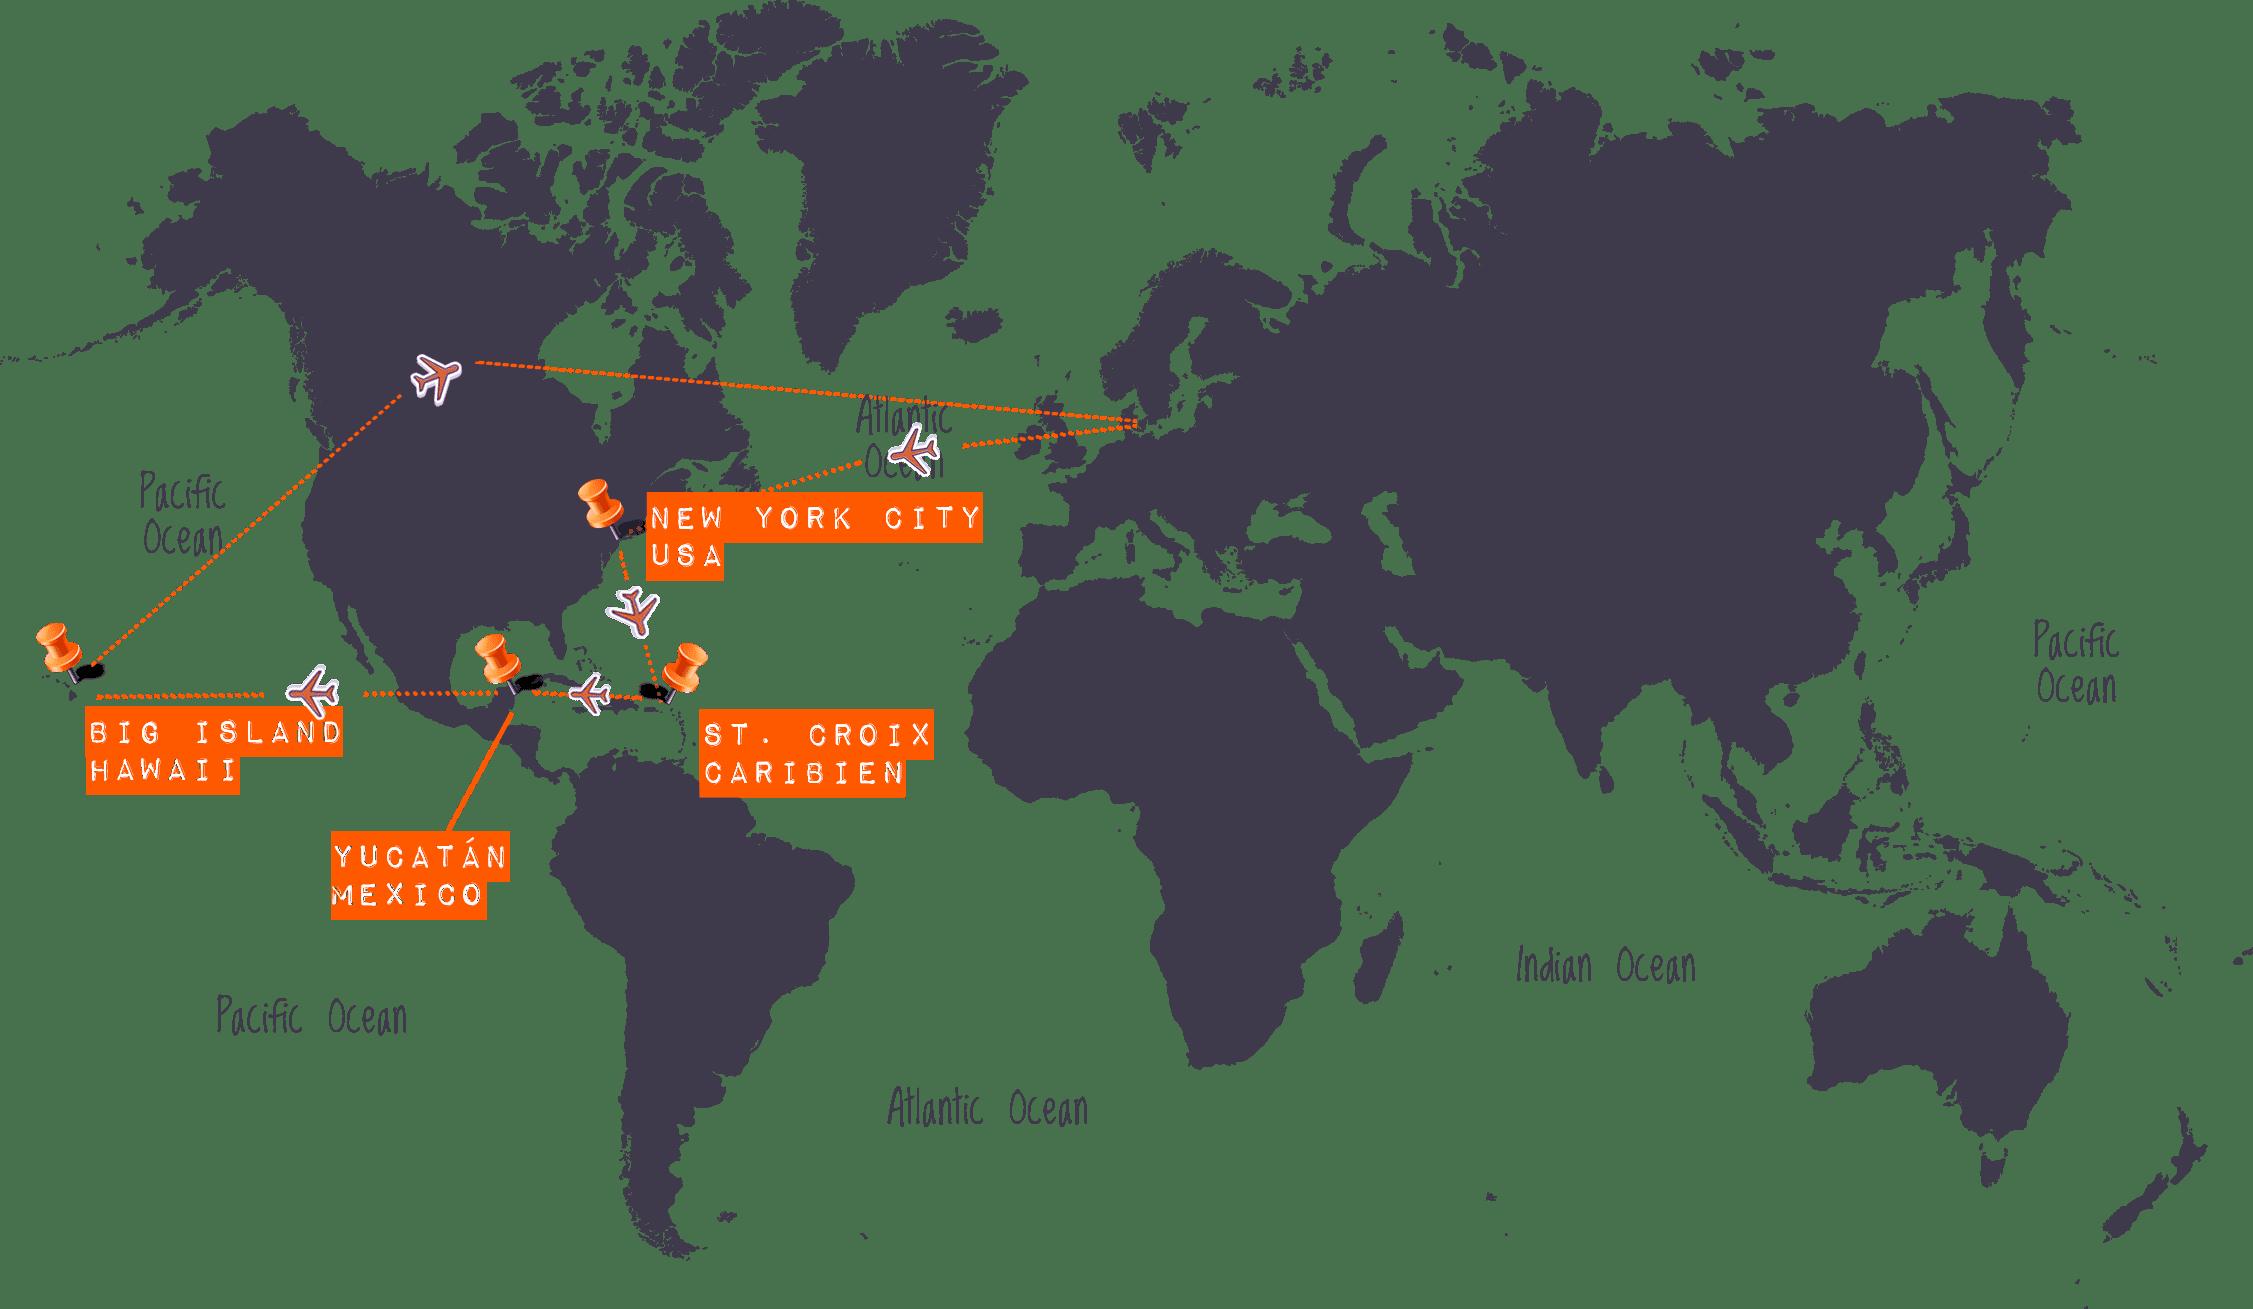 Højskole på Hawaii, Caribien & Mexico